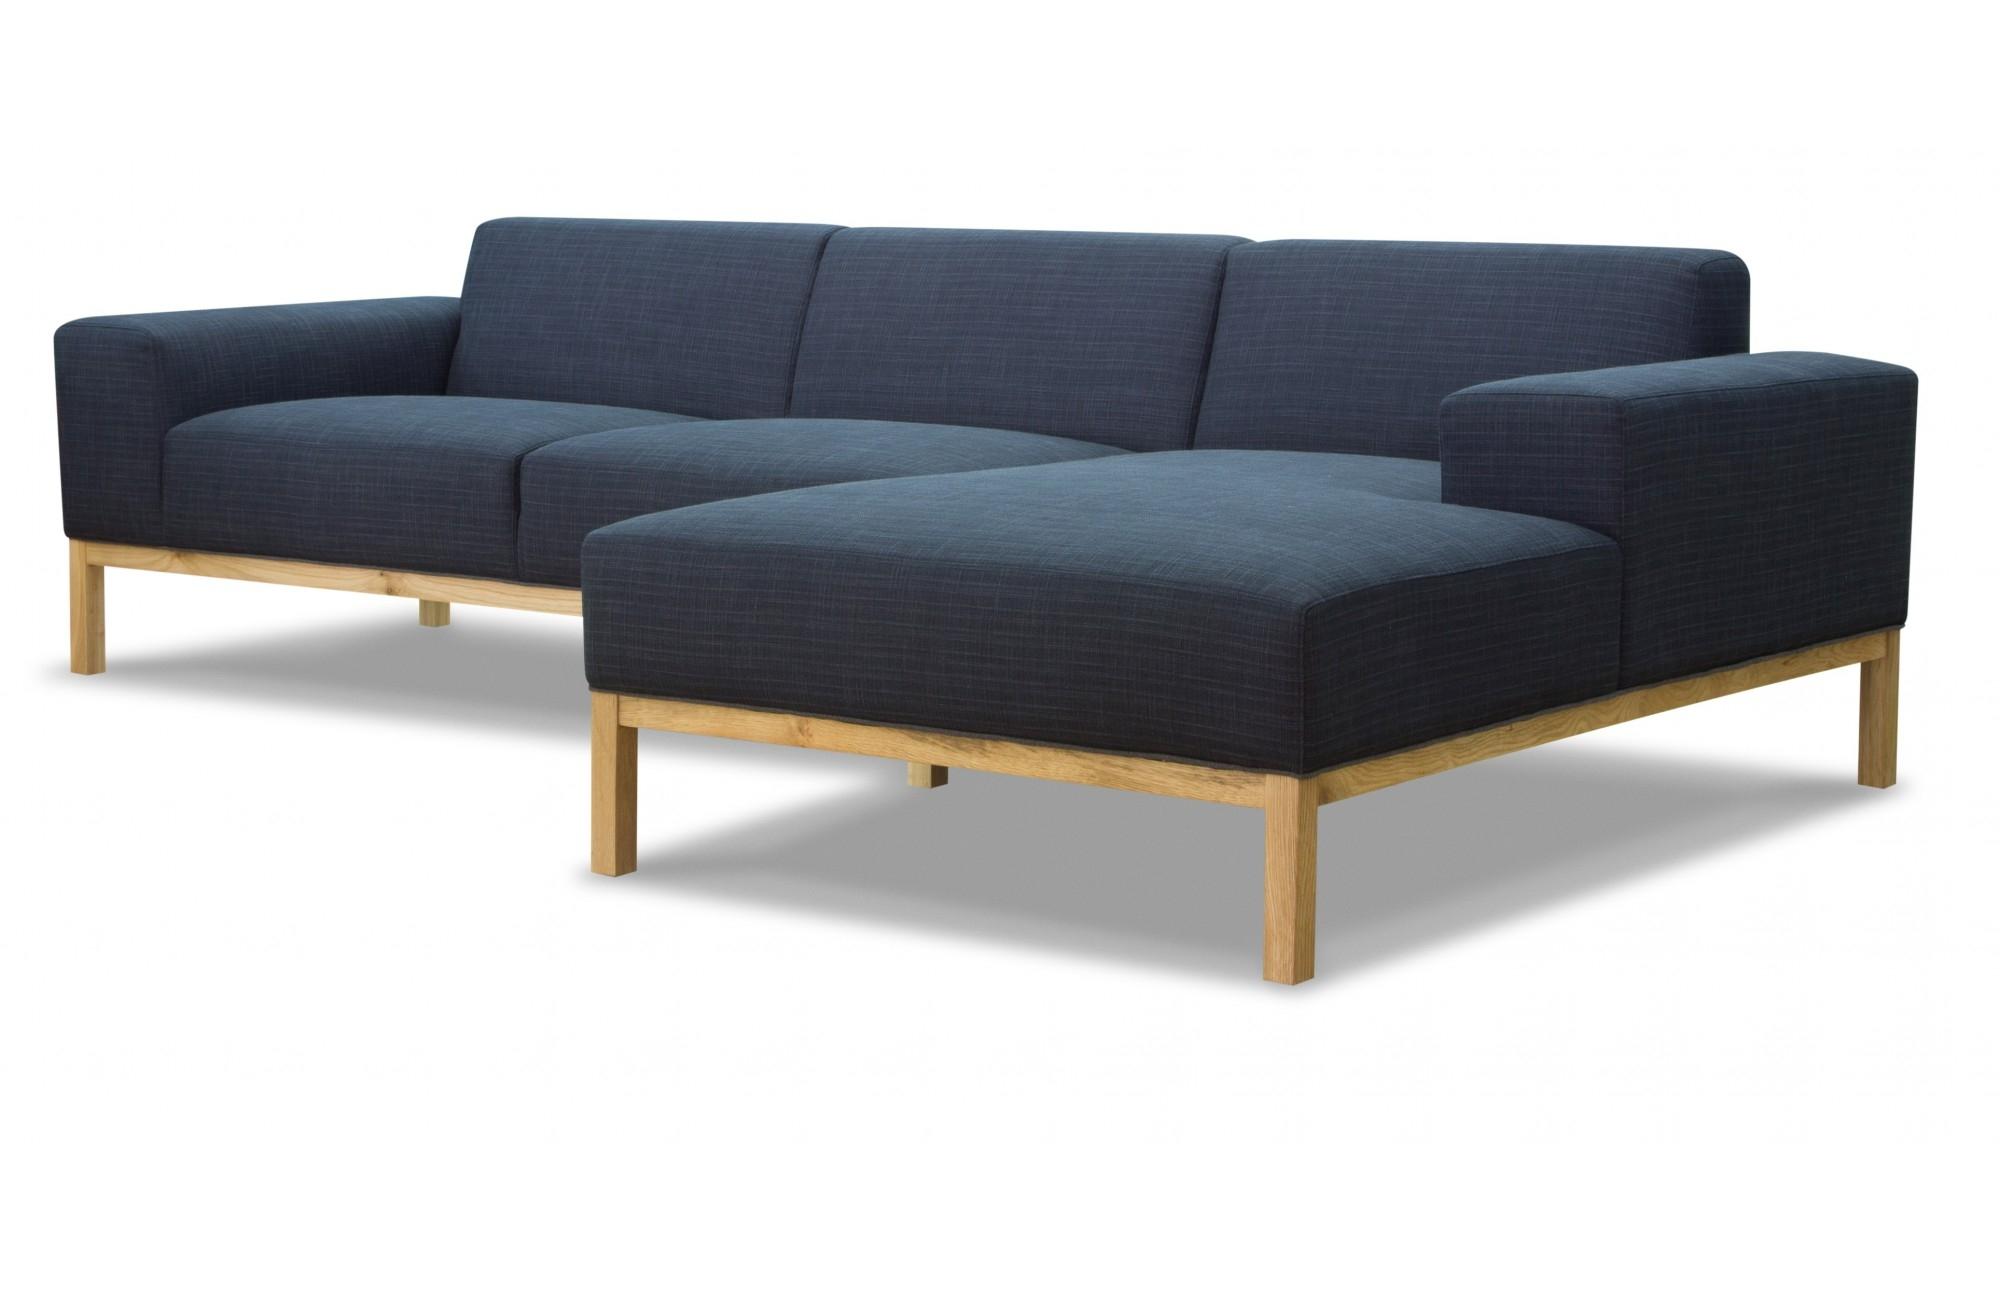 Adam Modular Corner Sofa In Ebony Modern Originals And Home With Modular Corner Sofas (Image 1 of 15)